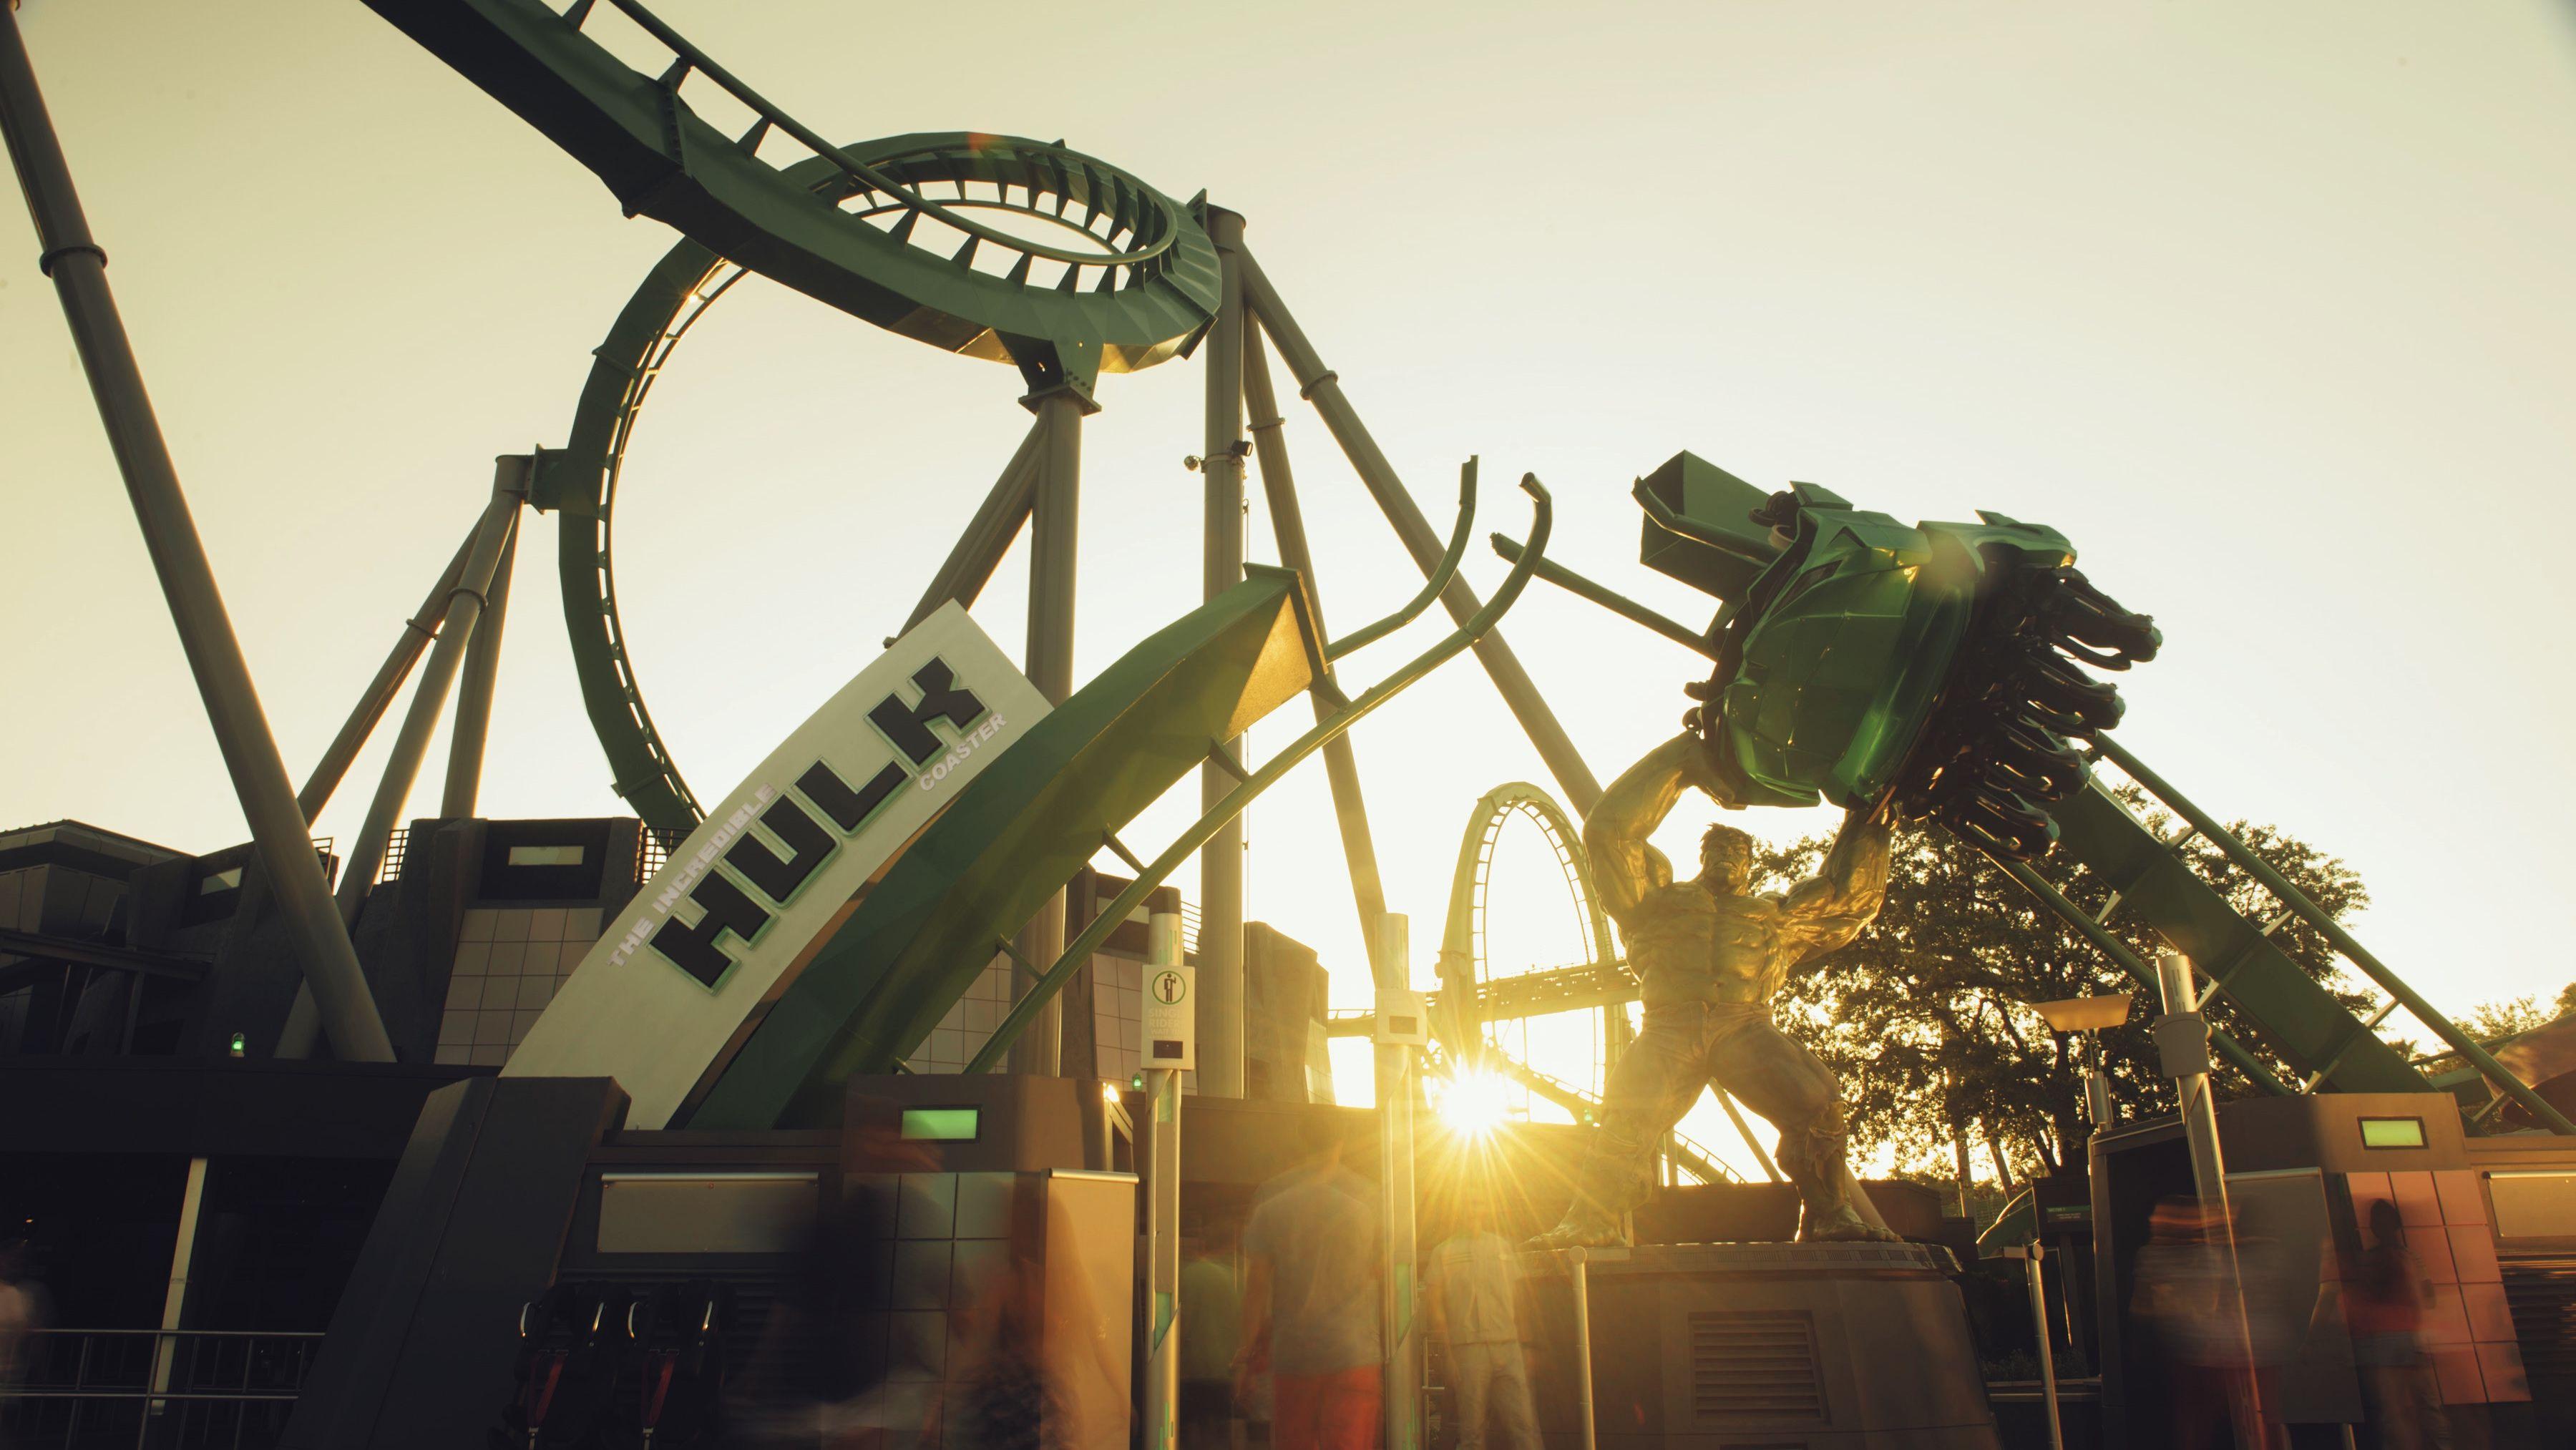 The Hulk in Universal Orlando